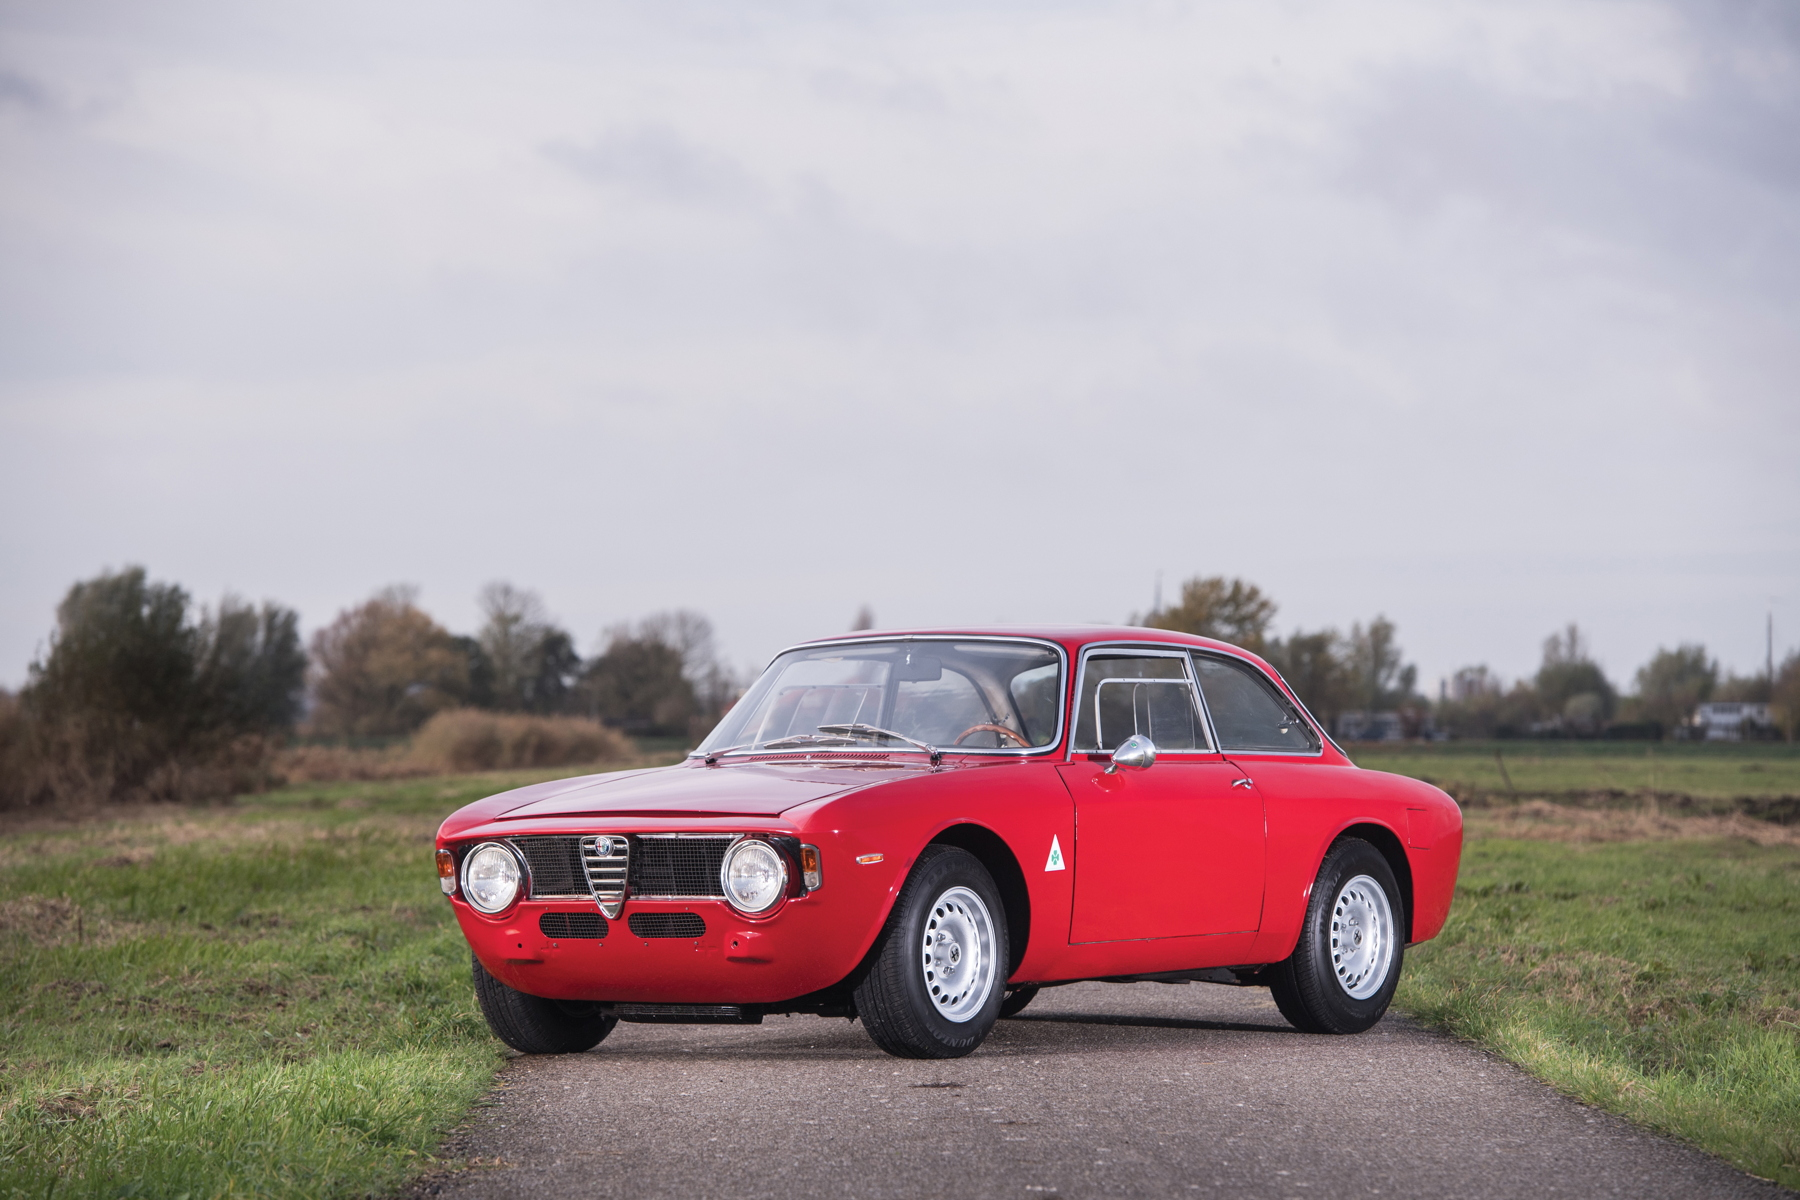 RM Sotheby's Retromobile - Alfa Romeo Giulia Sprint GTA front